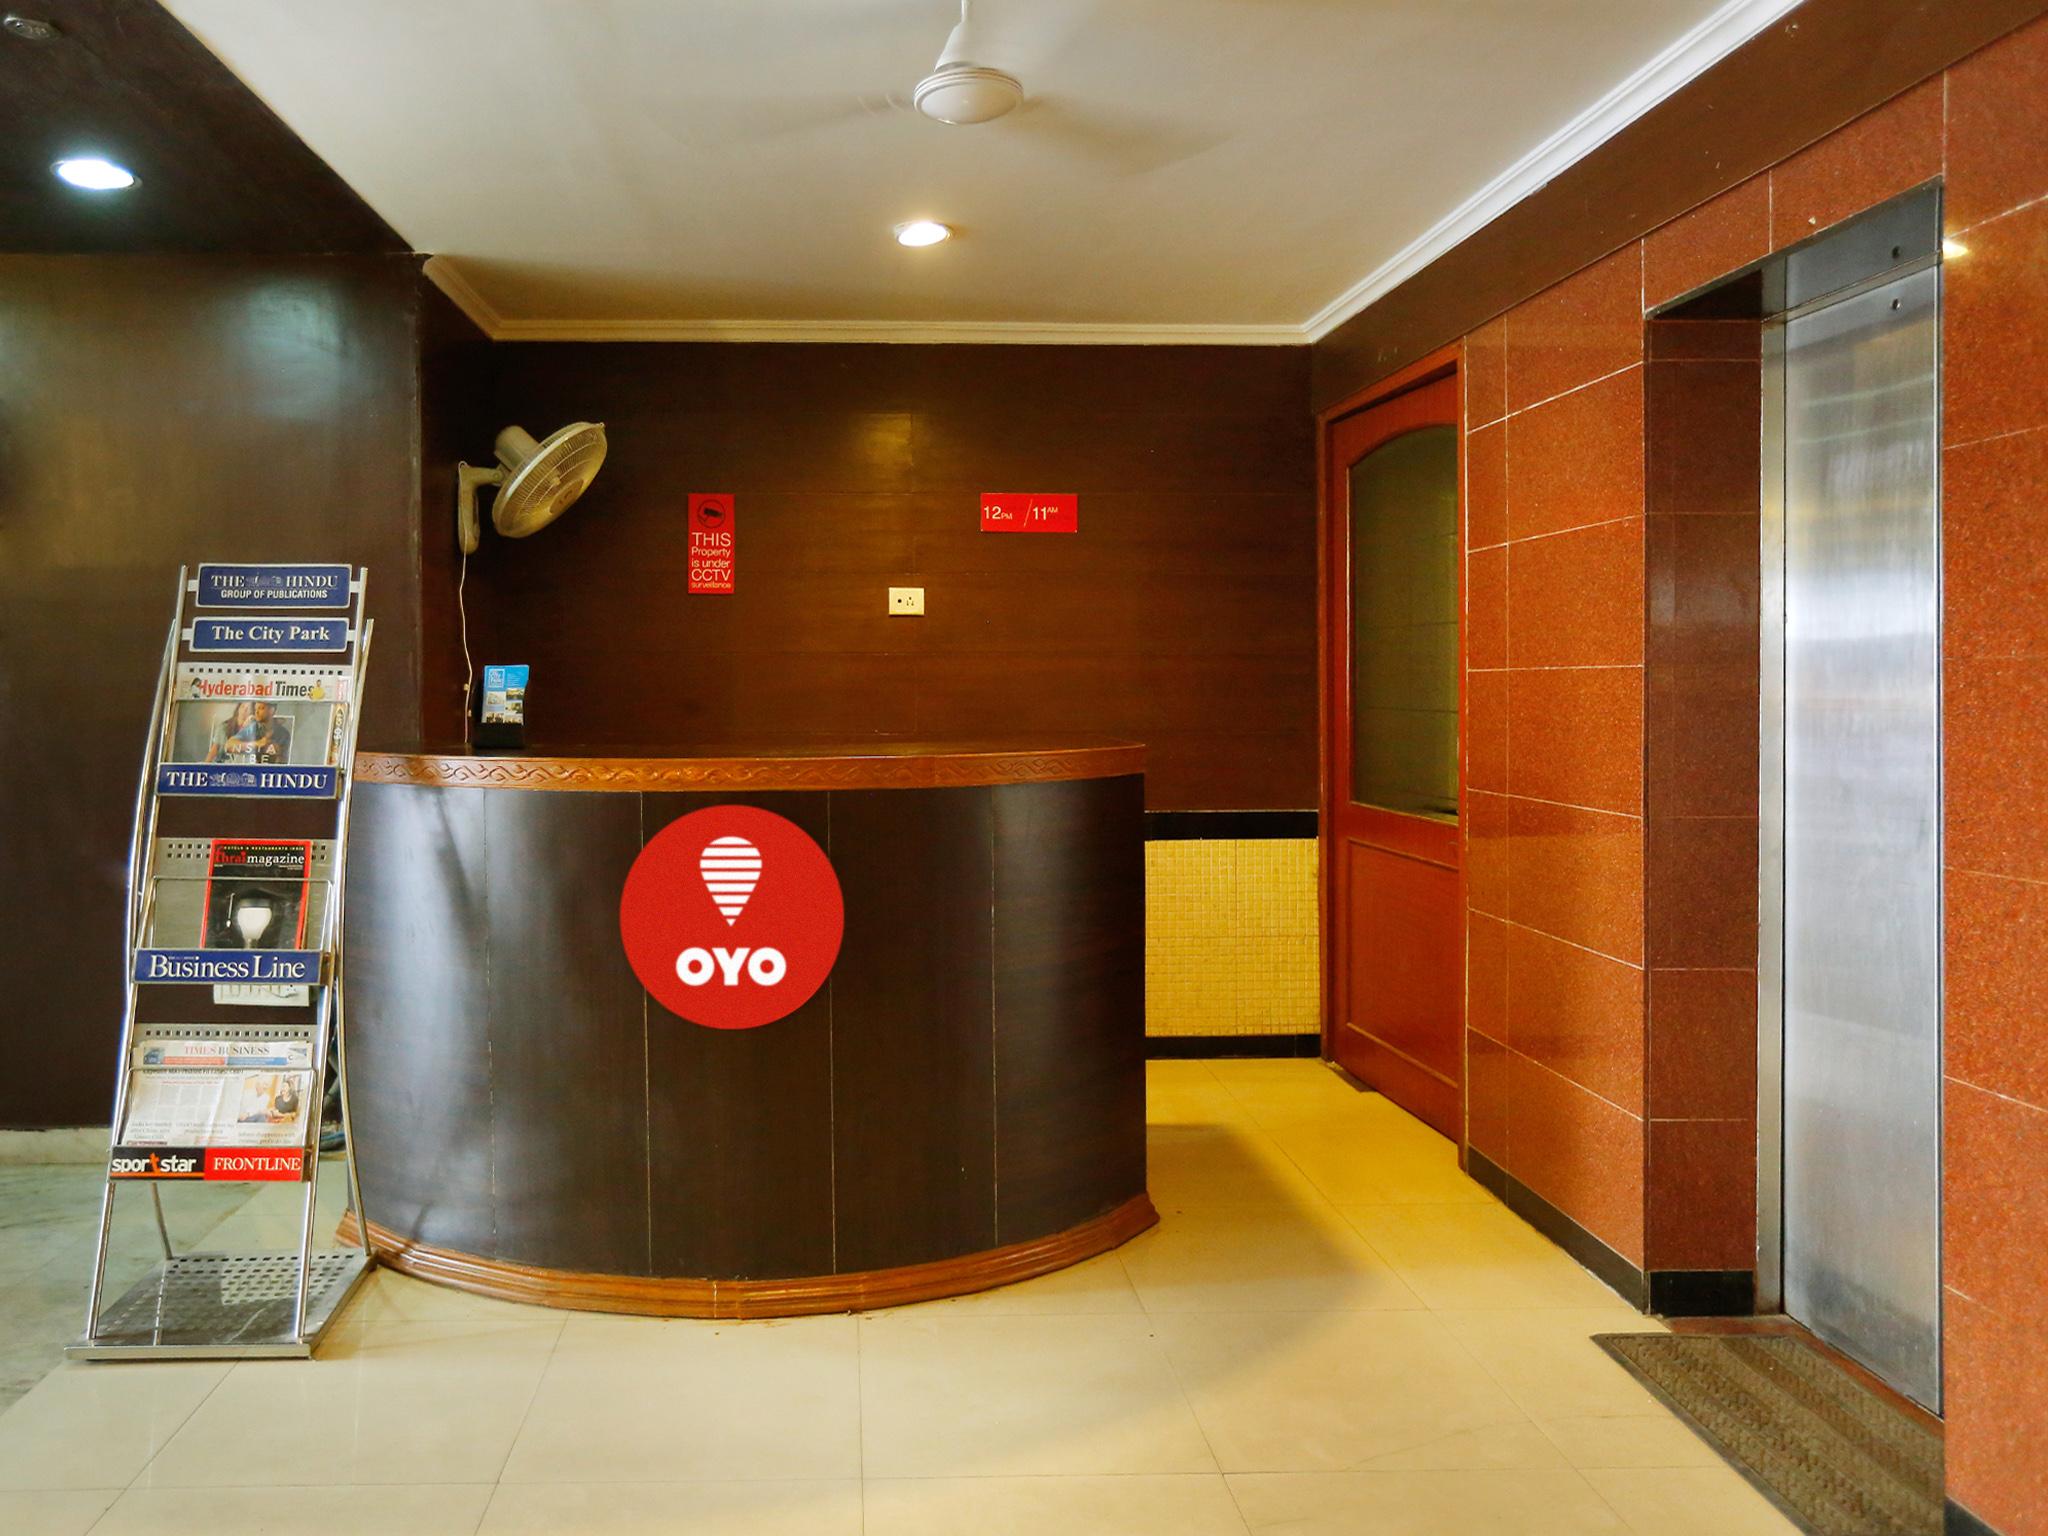 OYO Flagship 362 Hyderabad Abids in hyderabad